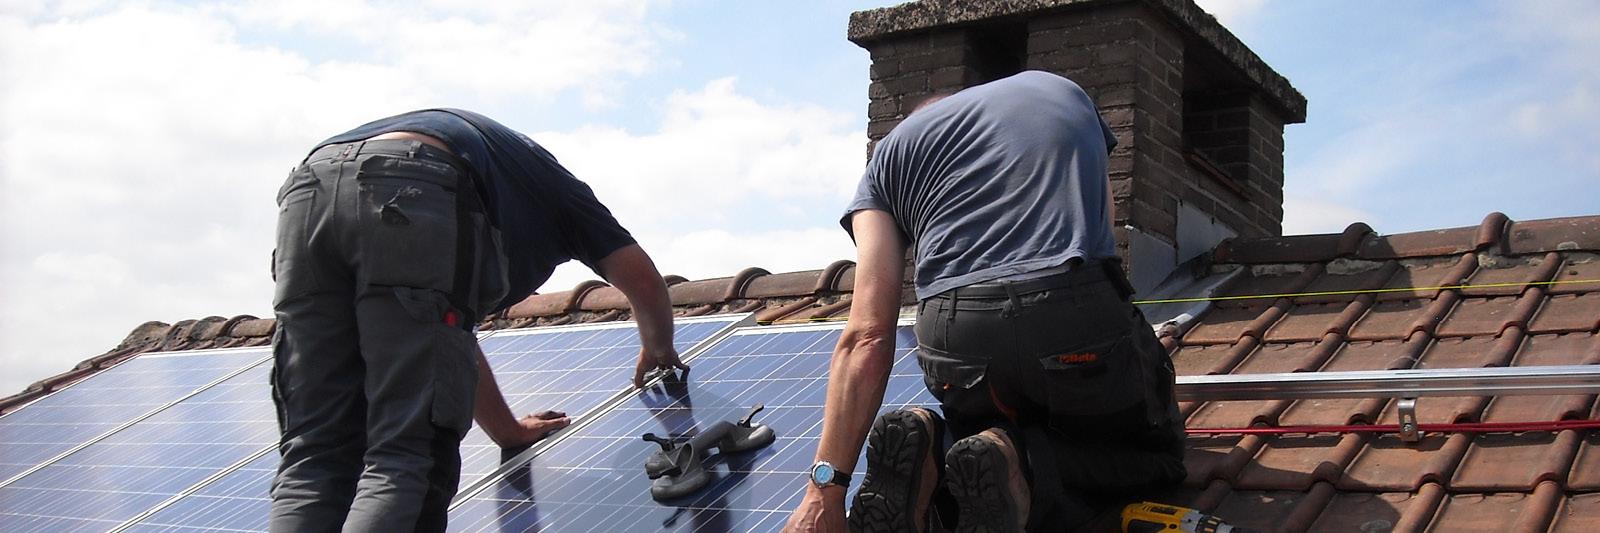 Bau Photovoltaik Solar Anlage